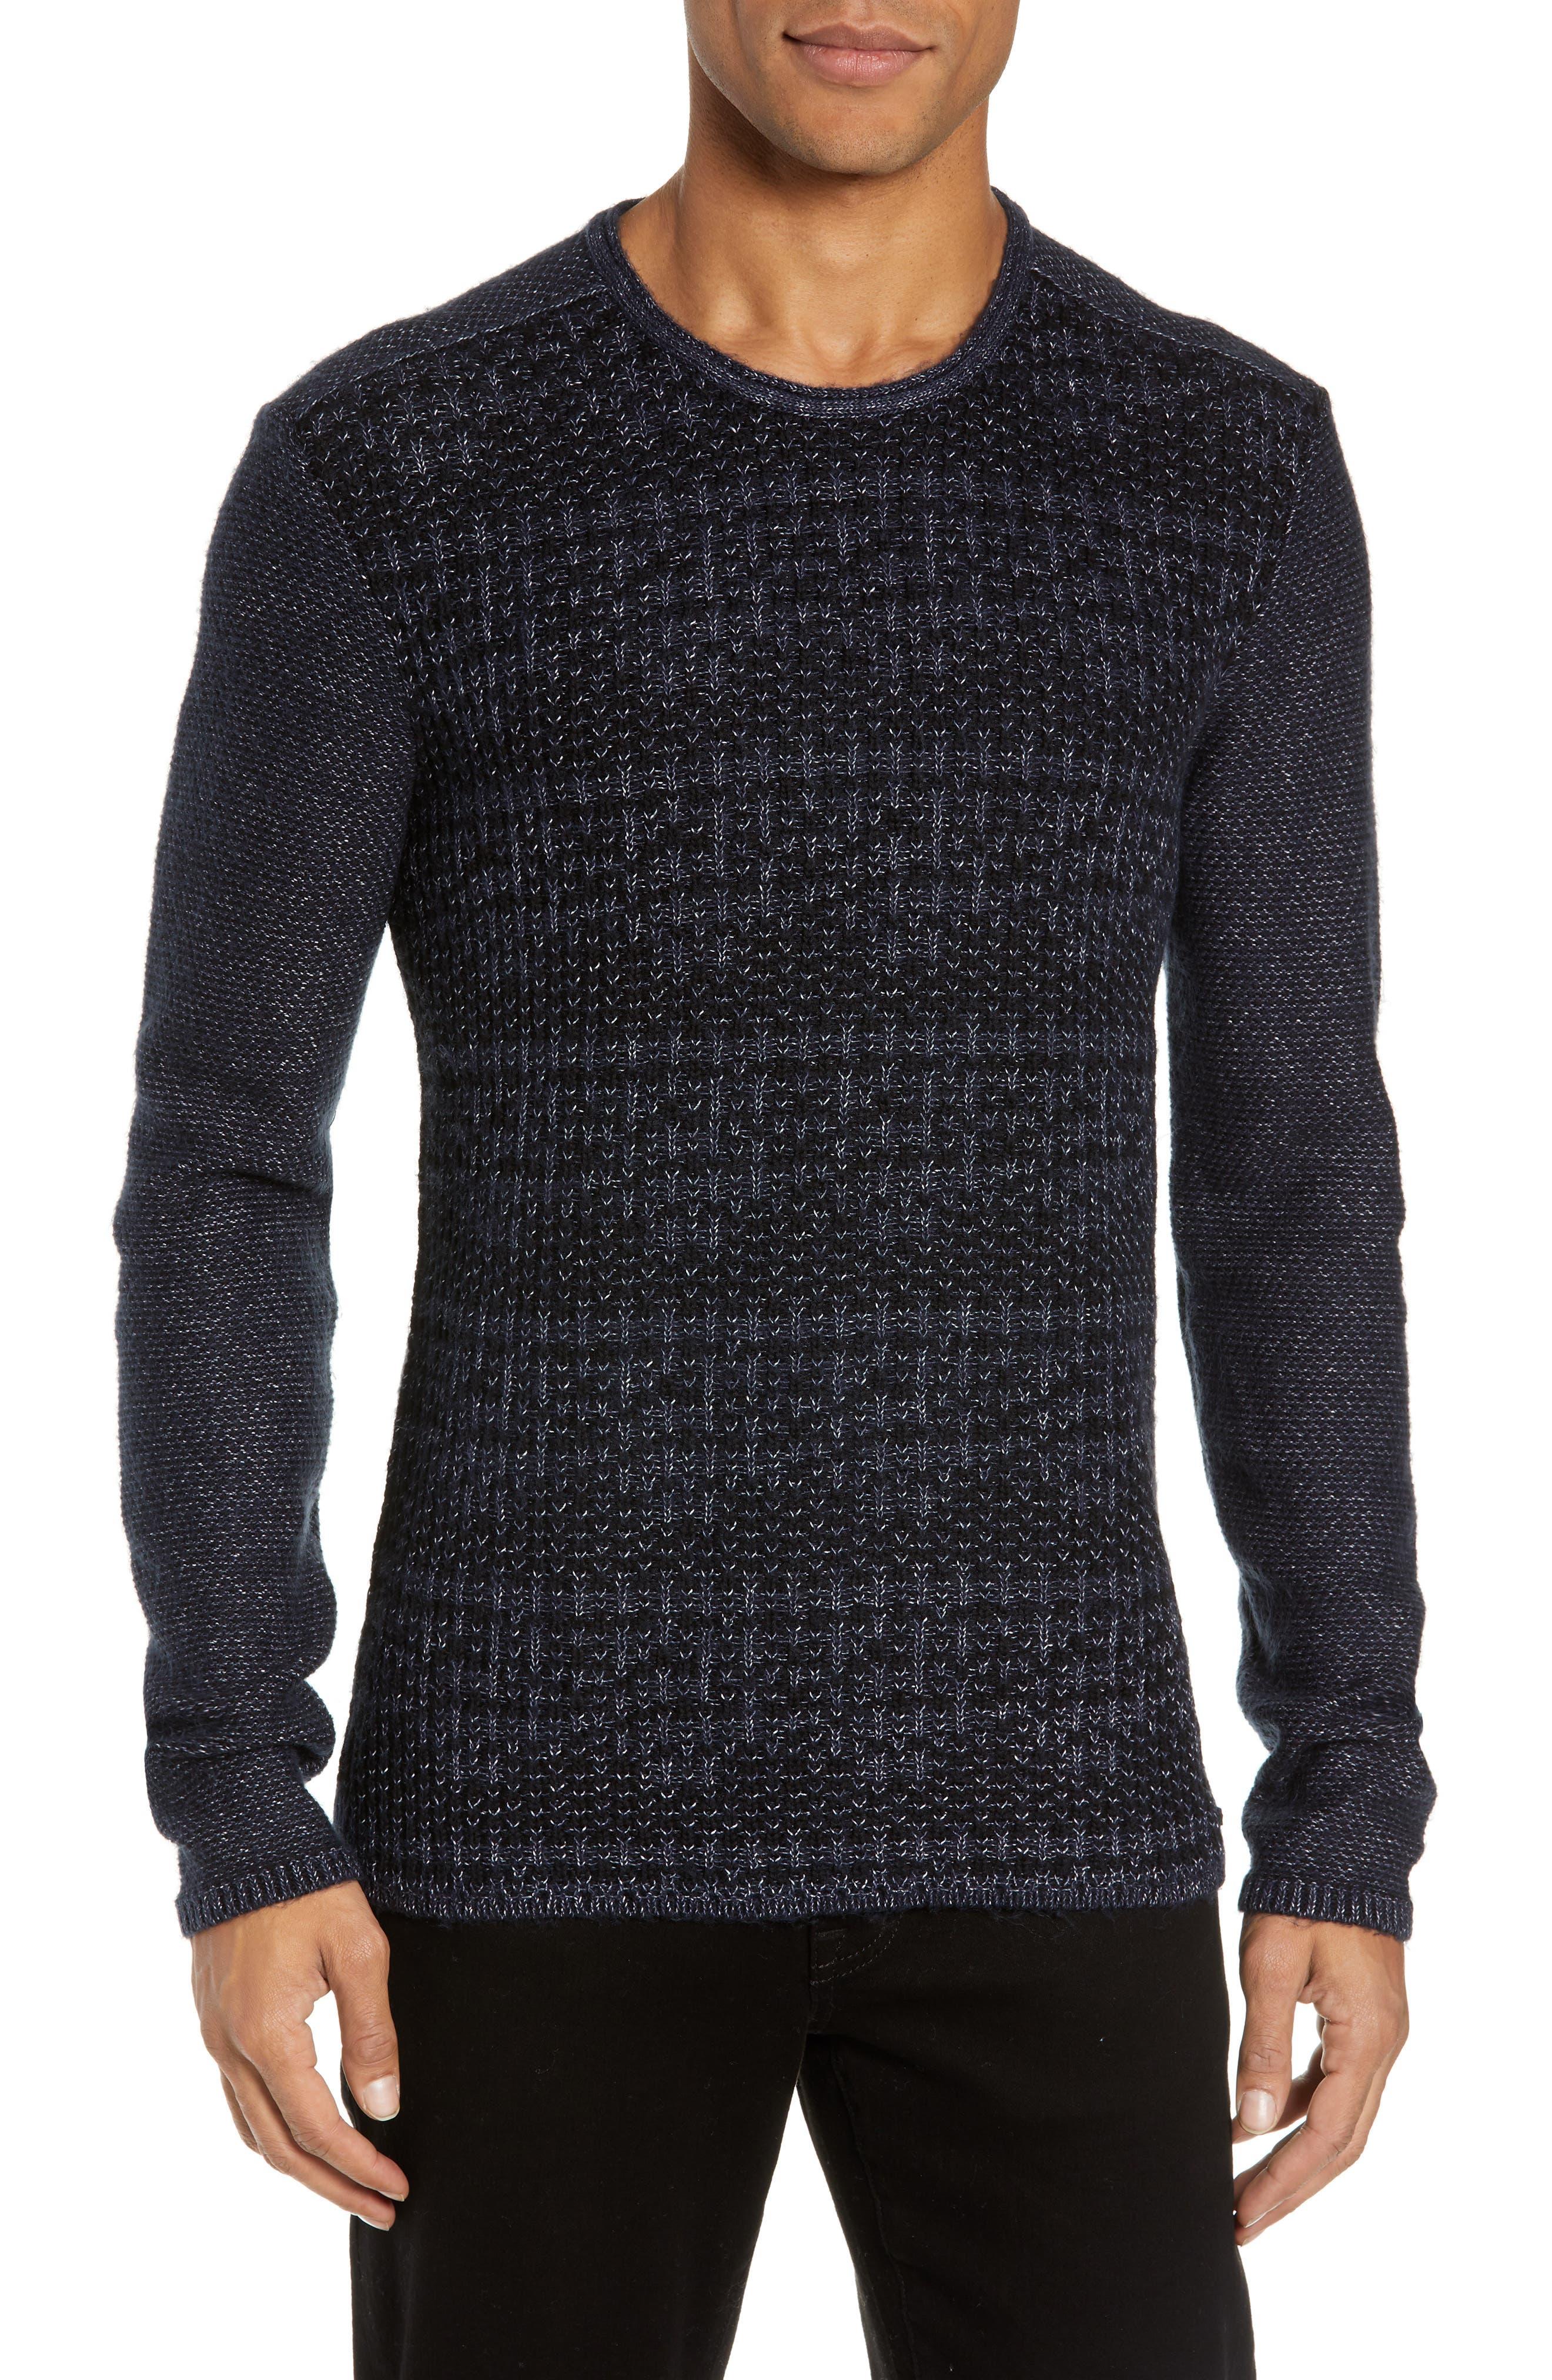 Mix Stitch Regular Fit Cotton Blend Sweater,                             Main thumbnail 1, color,                             INK BLUE